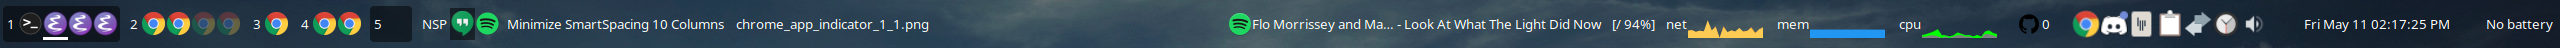 "<a href=""https://github.com/taffybar/taffybar/blob/master/doc/screenshot.png"">https://github.com/taffybar/taffybar/blob/master/doc/screenshot.png</a>"